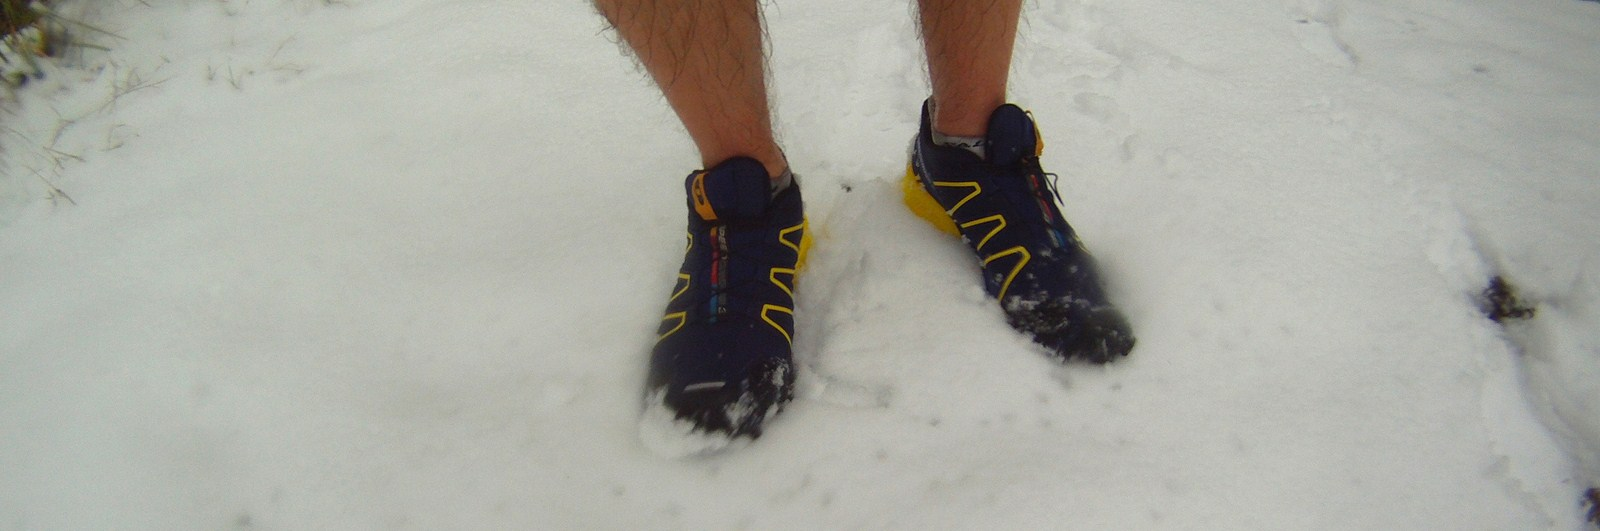 Test des chaussures de trail Salomon SpeedCross 3 – VersLeSommet